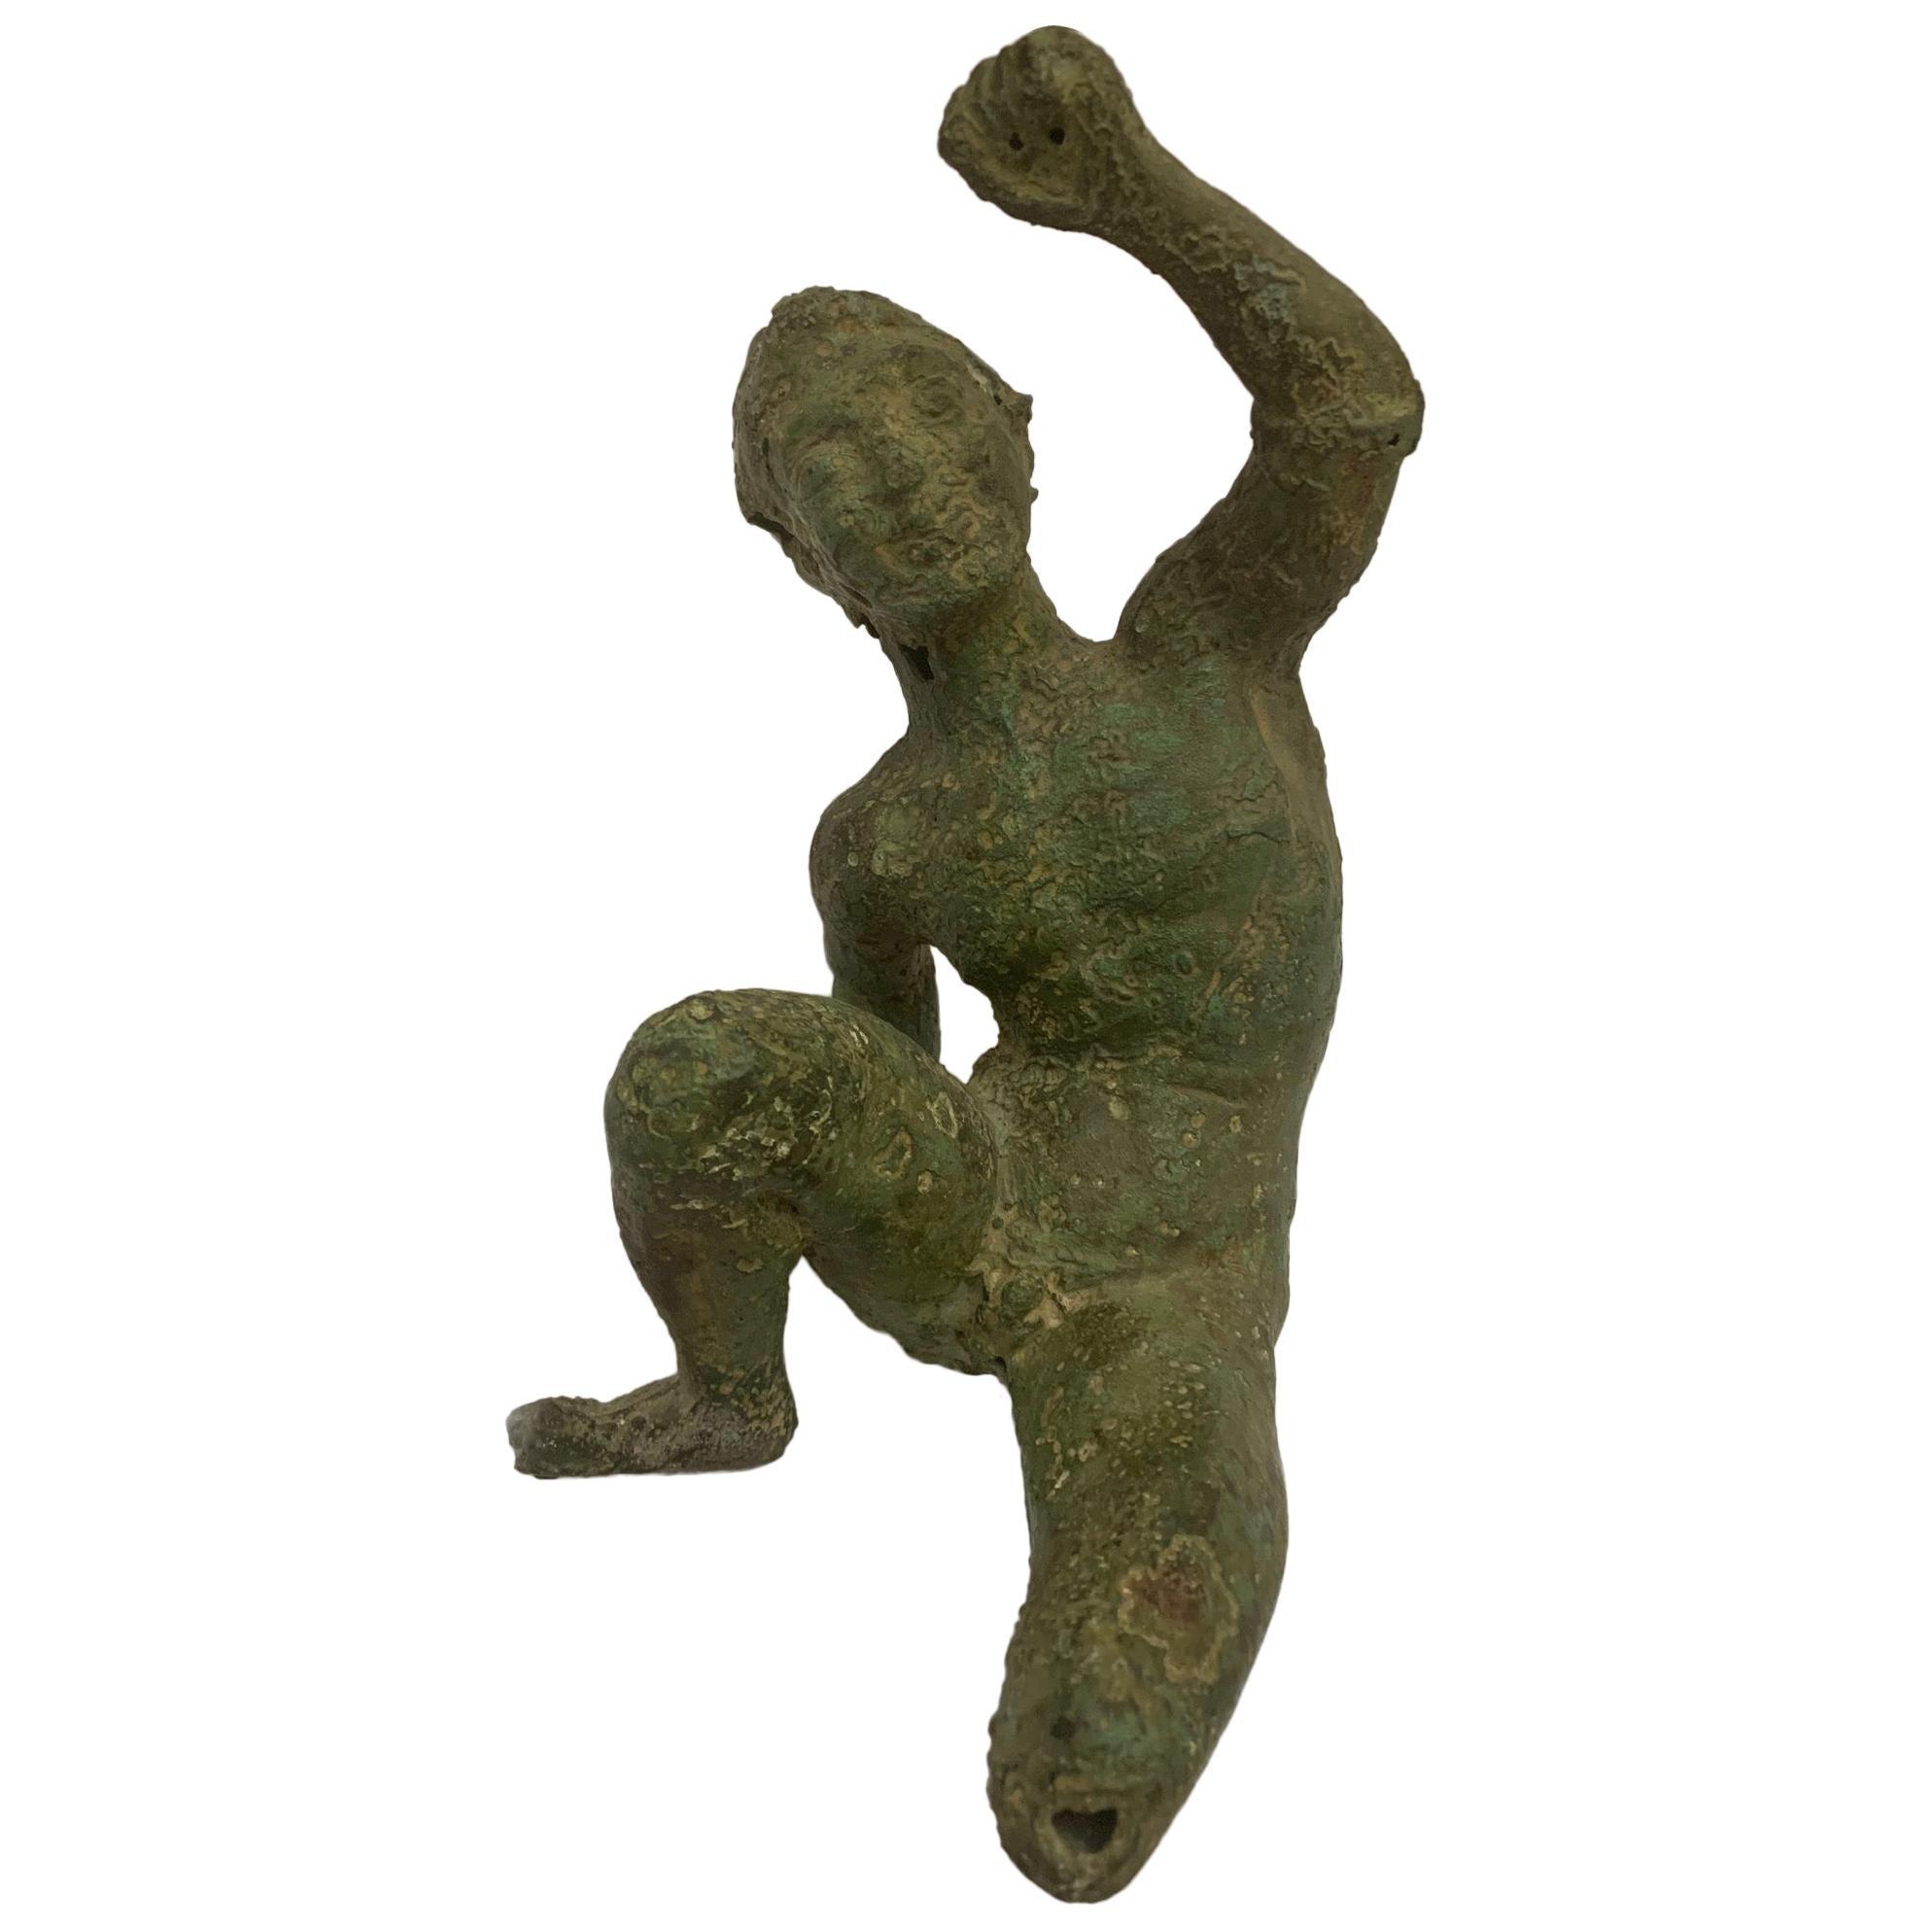 Replica of Sculpture from Pompeii